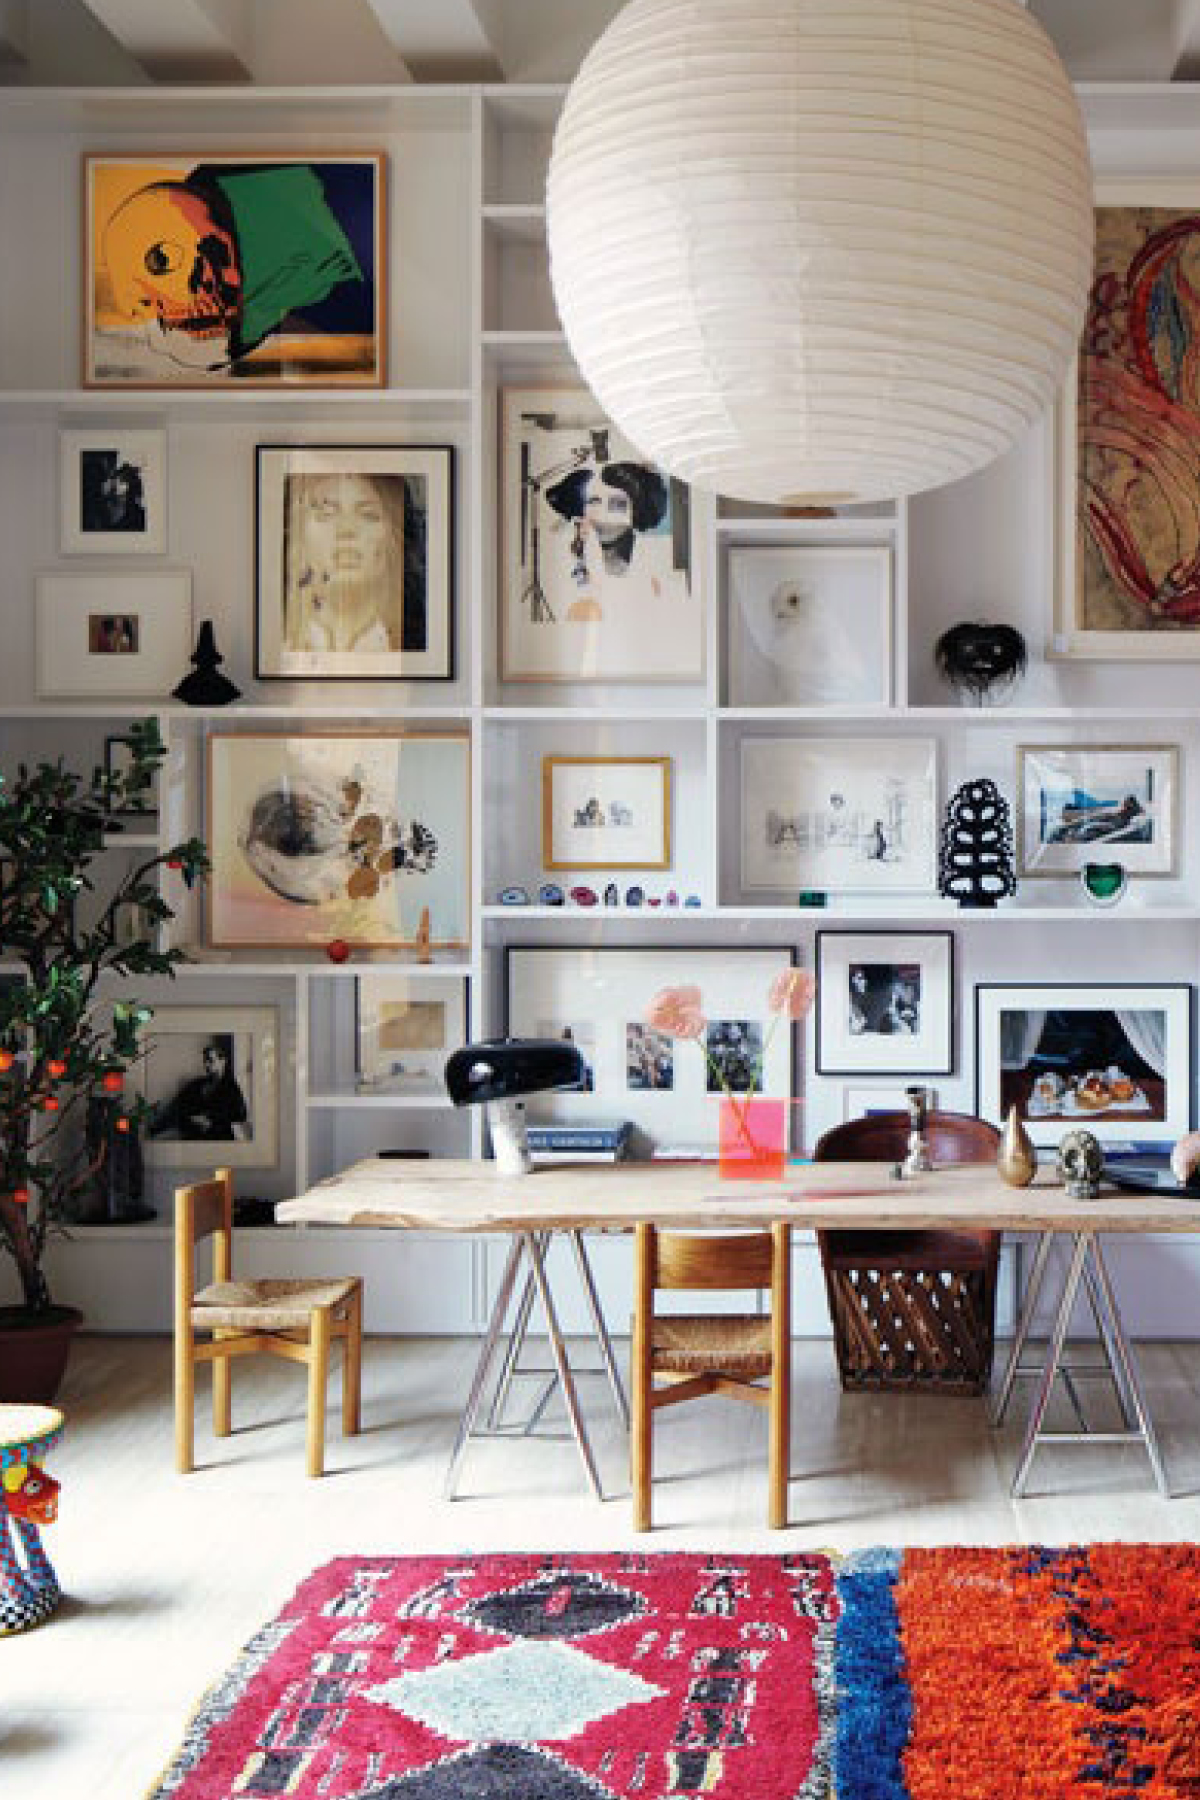 Gallery wall via architecturaldigest